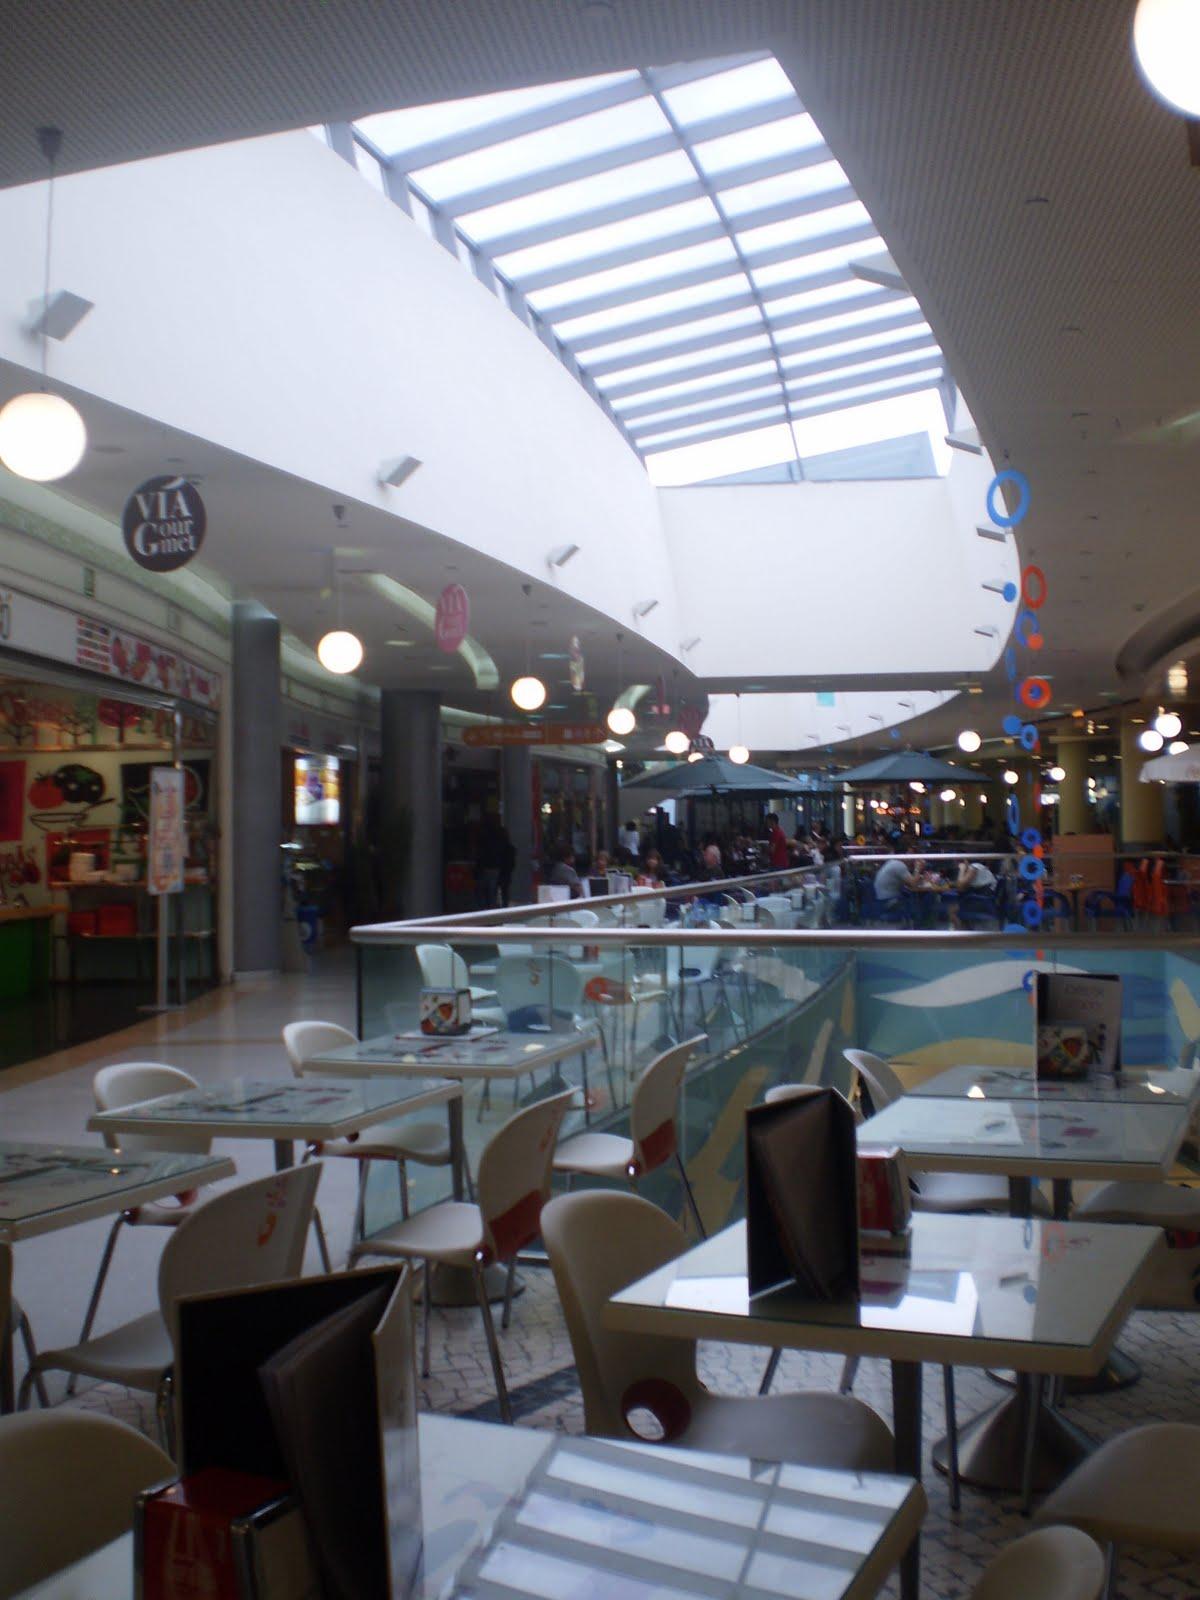 cines centro comercial gran via de vigo: